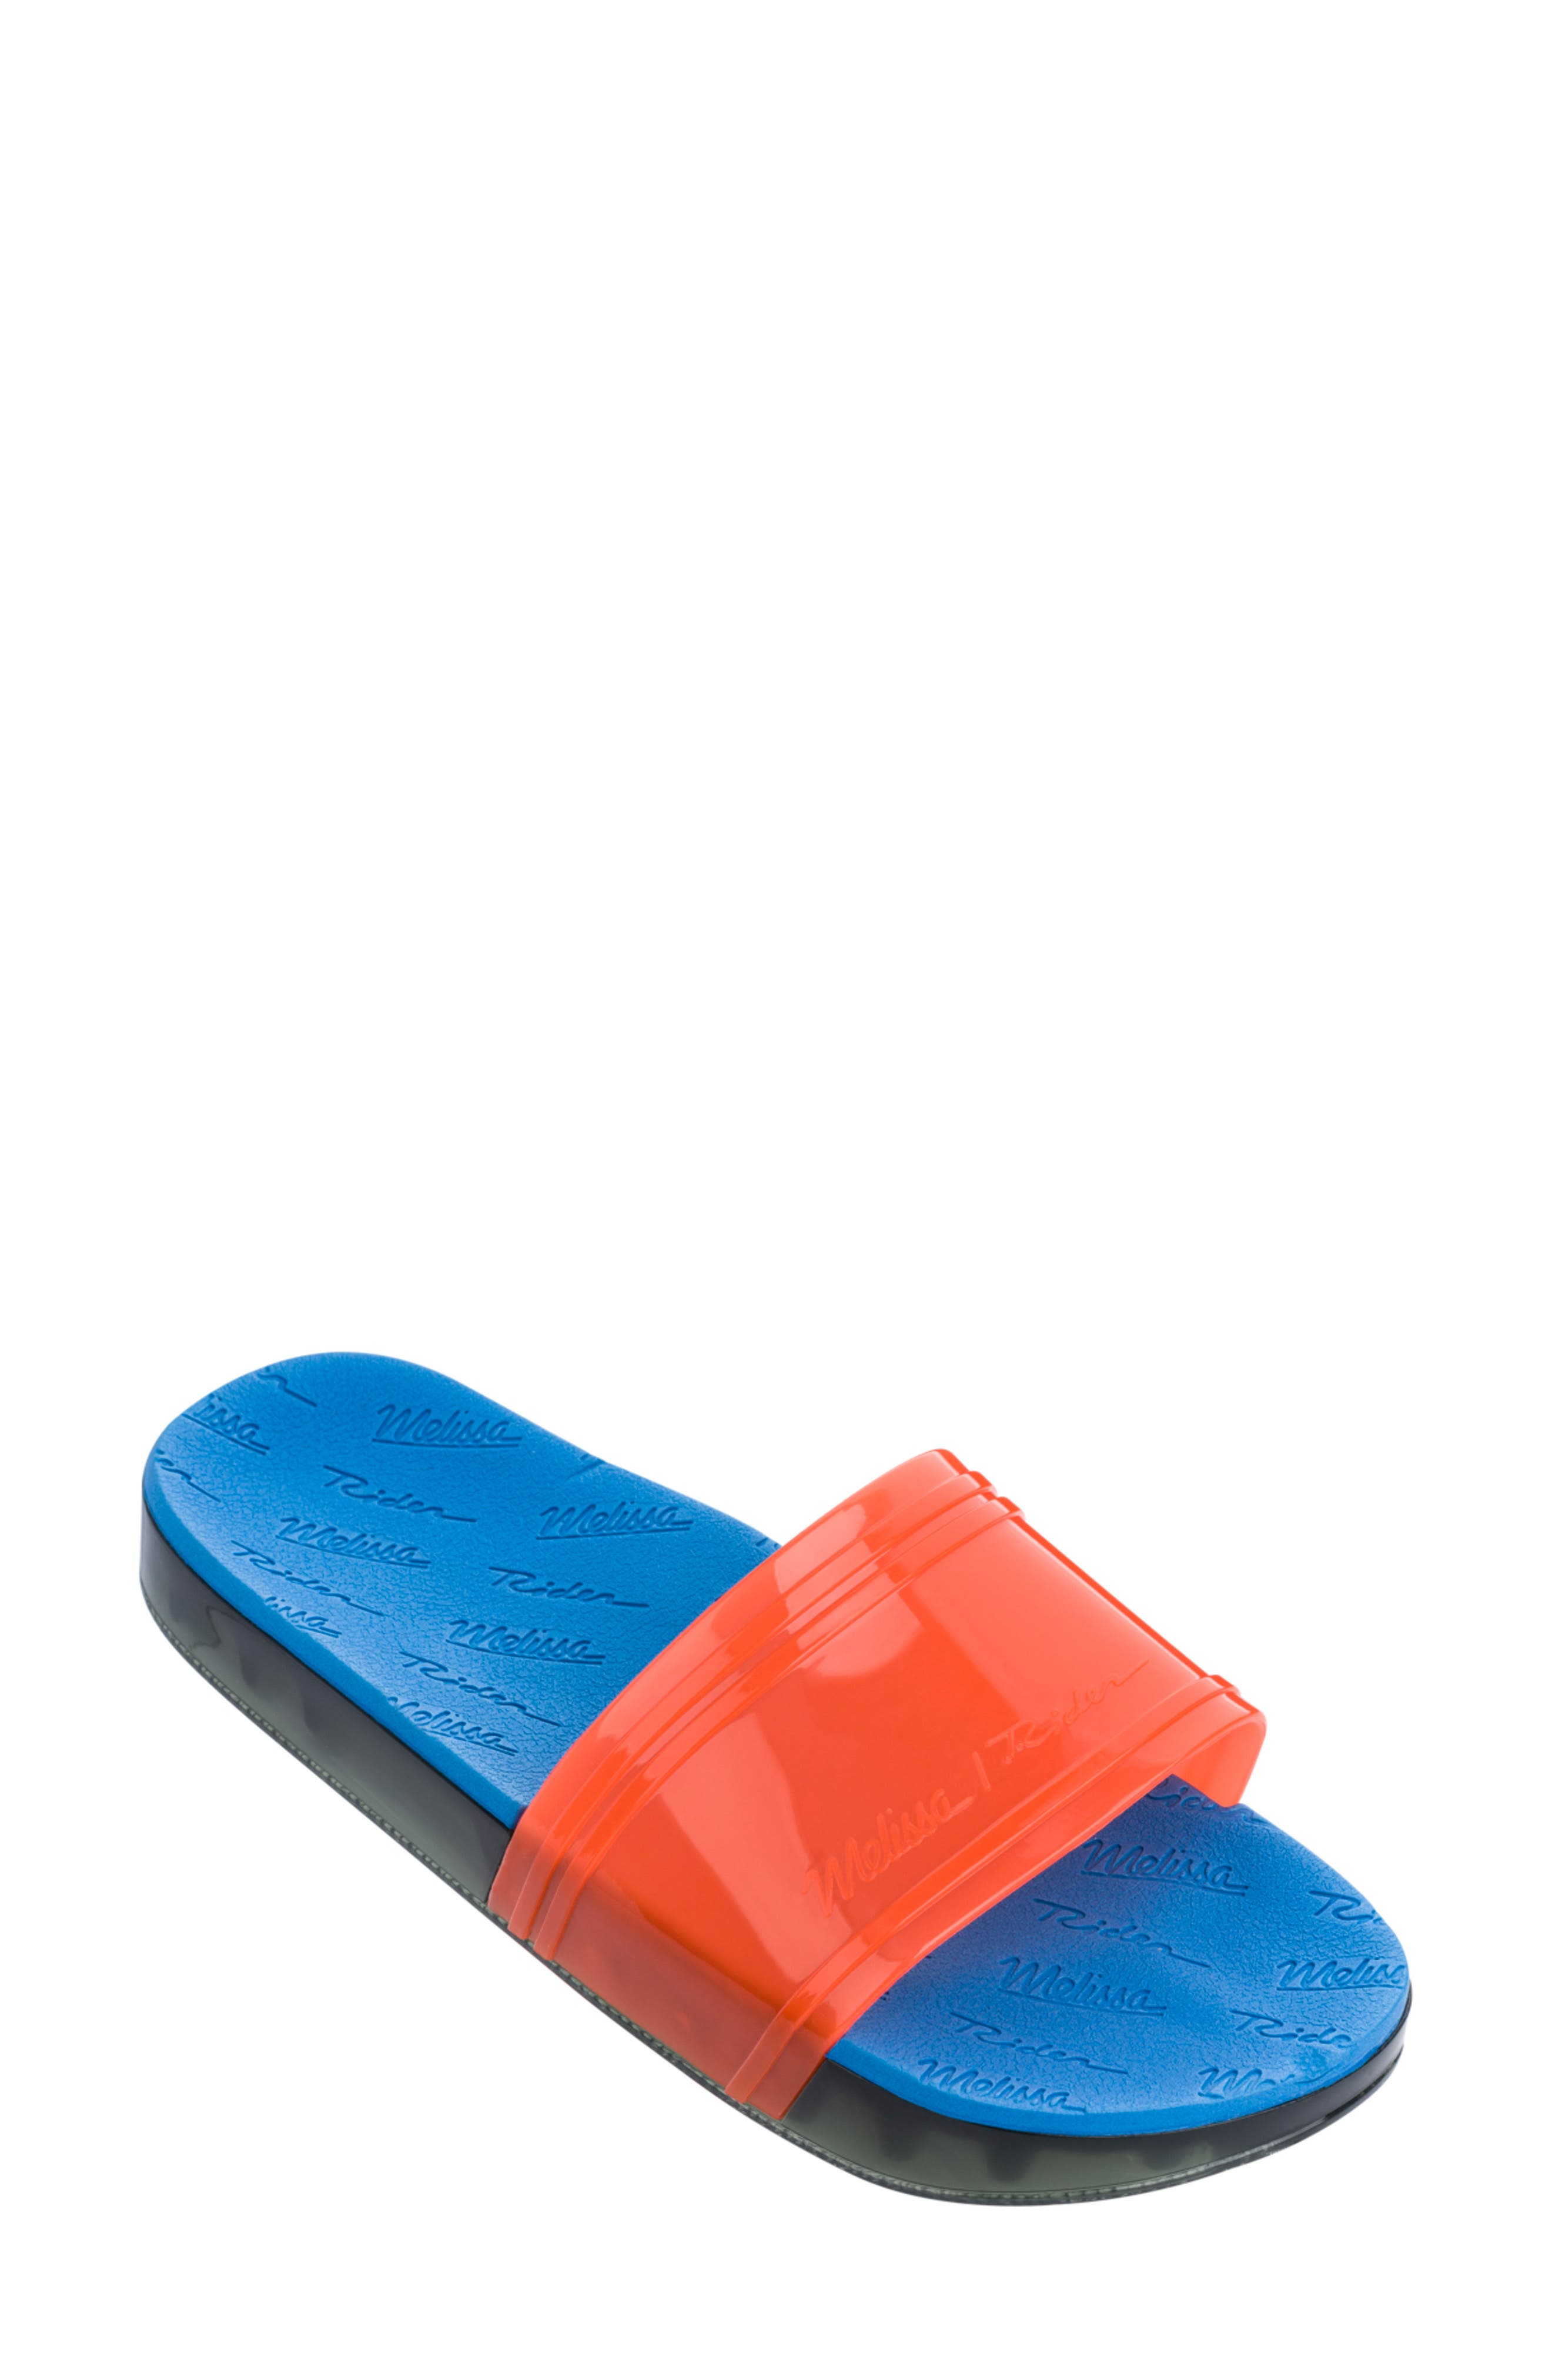 Melissa Slide Rider Sport Slide, Orange